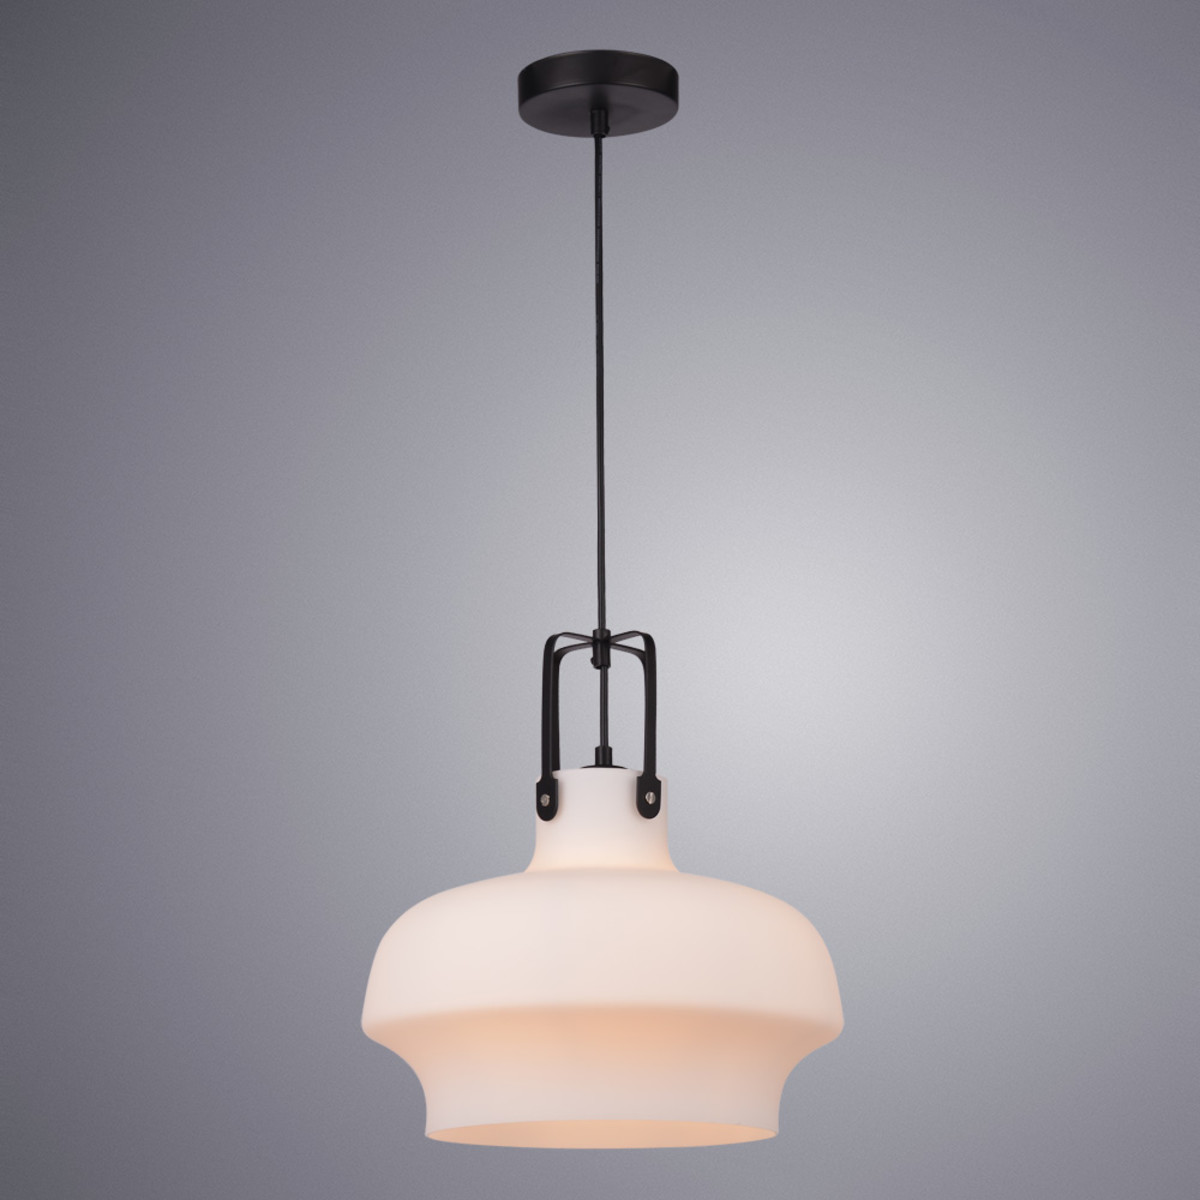 Люстра Arte Lamp Arno A3633SP-1WH E27 1 лампа